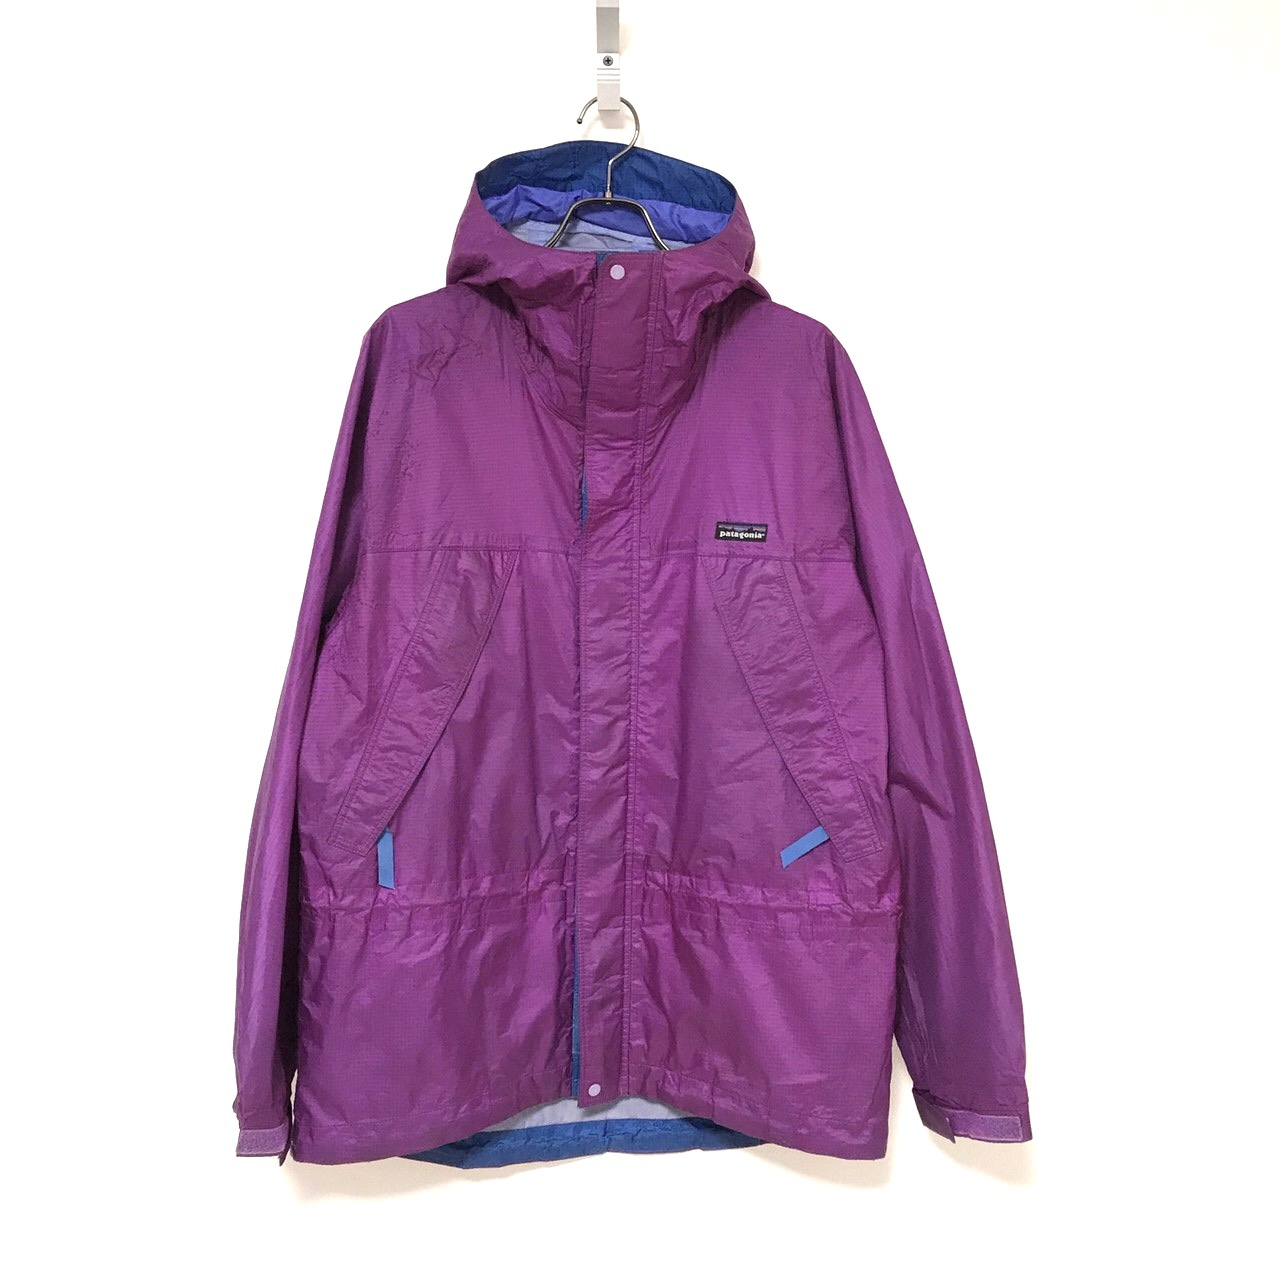 ⑨ 90's Patagonia Super Pluma Jacket Bright Purple M